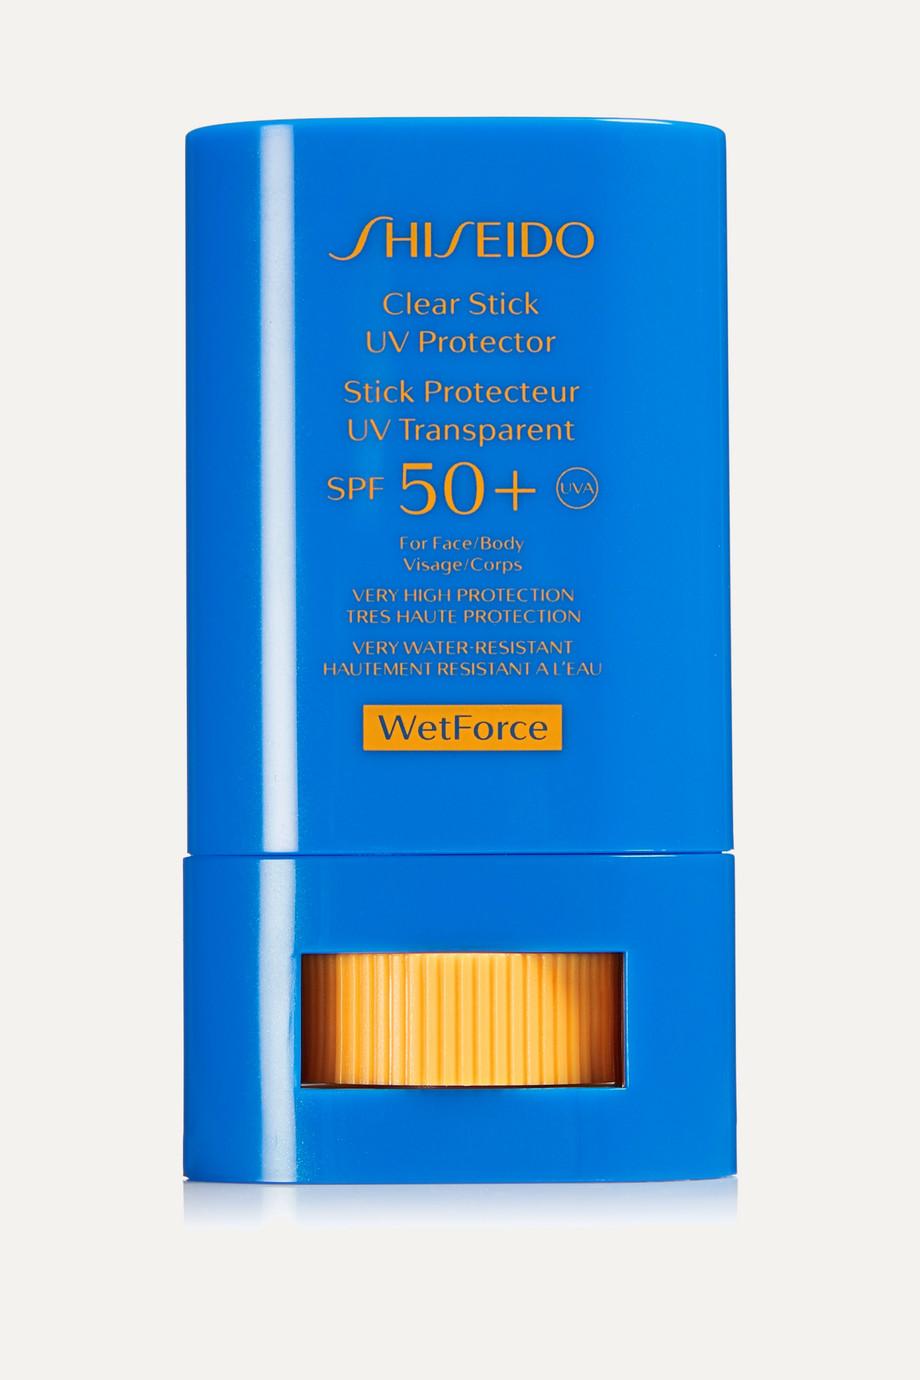 Shiseido Clear Stick UV Protector WetForce SPF50+, 15g